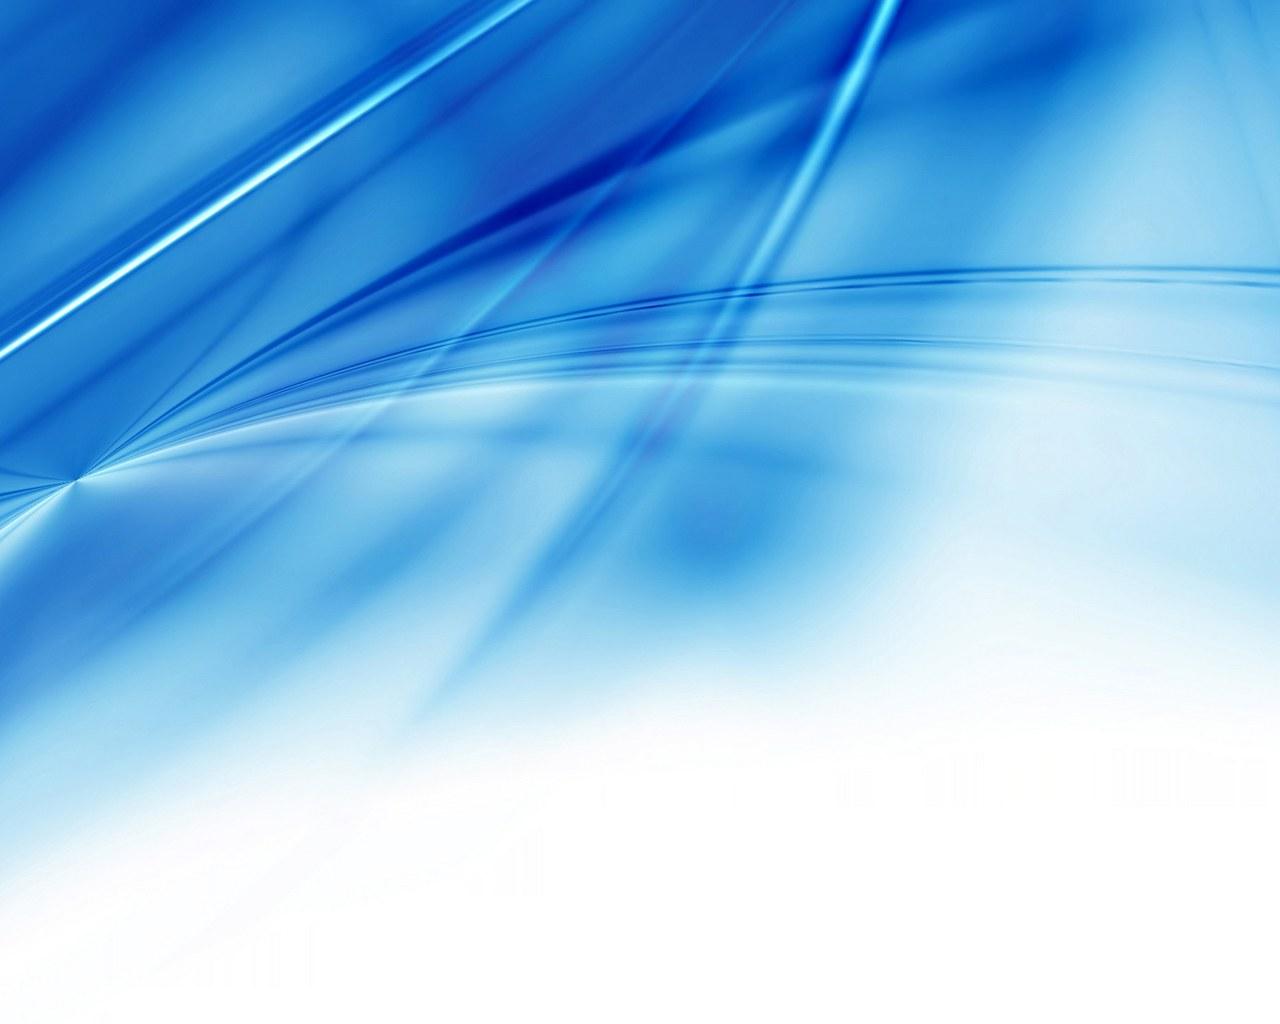 Cool Light Blue Backgrounds